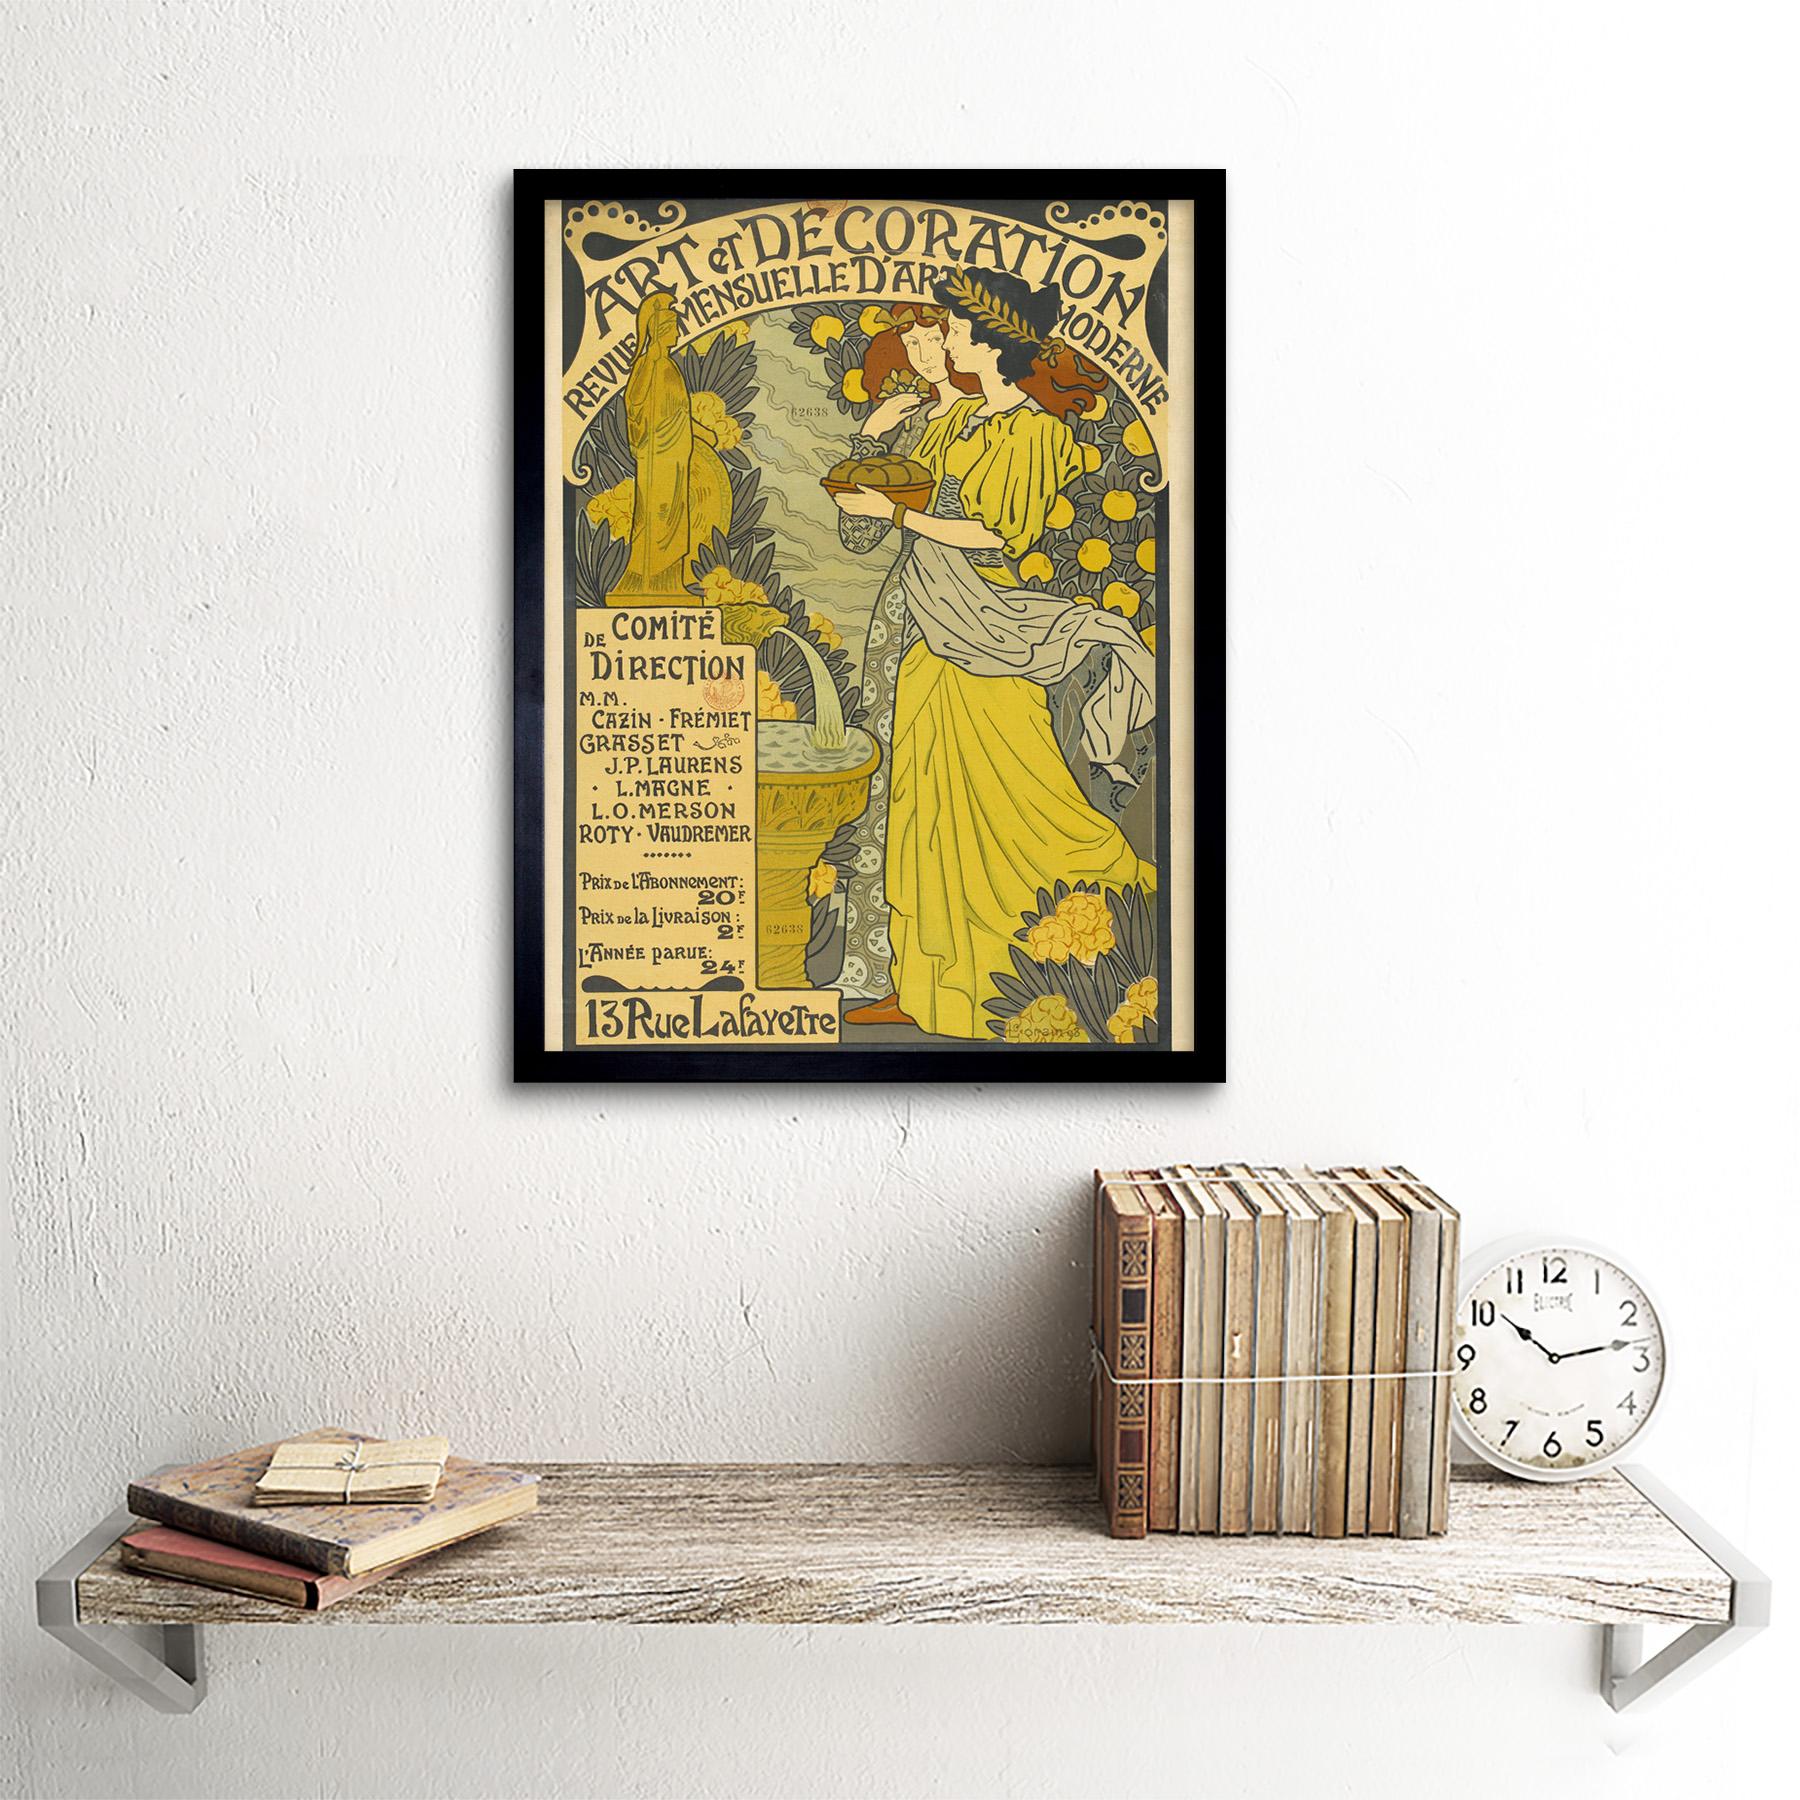 Lorain-Decoration-Magazine-Nouveau-French-Advert-Framed-Wall-Art-Poster thumbnail 3